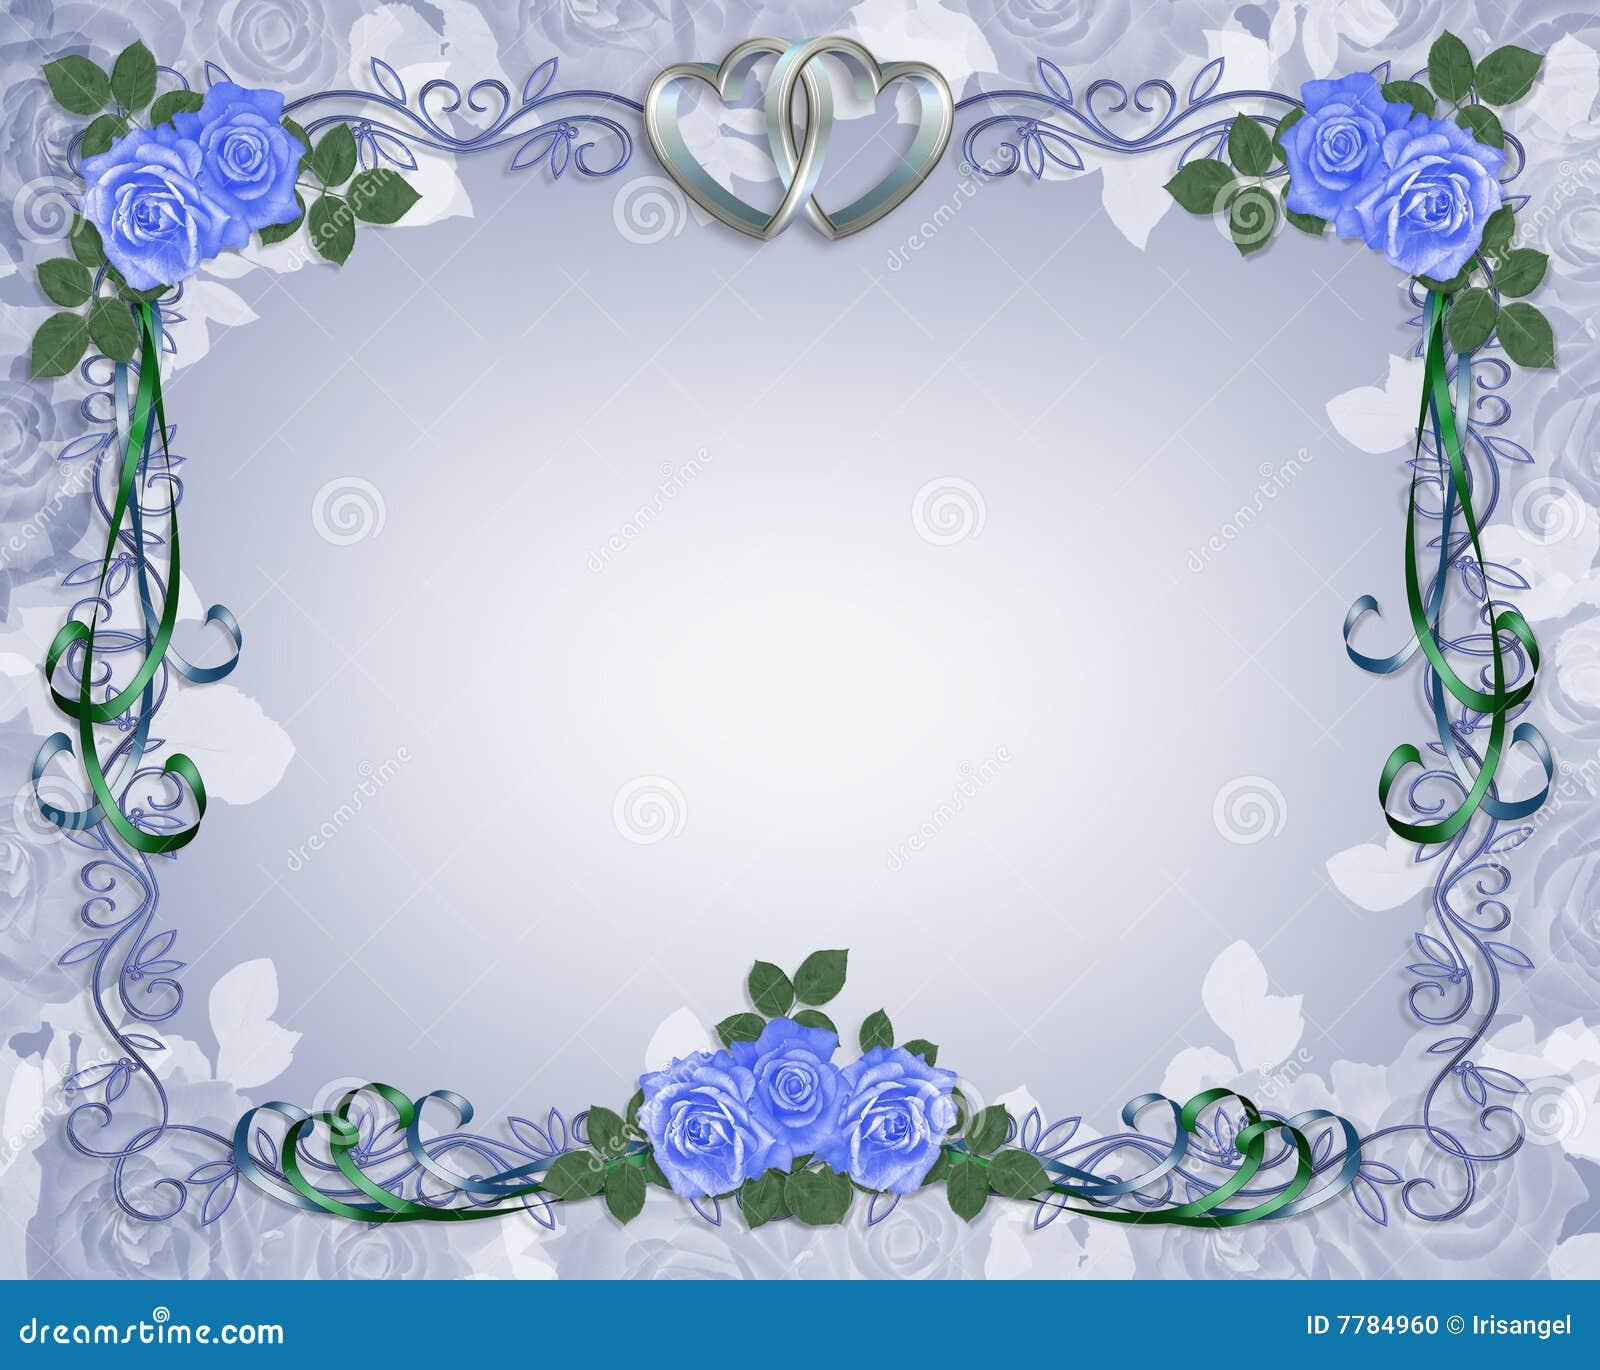 Wedding Invitation Border Blue Stock Illustration - Image ...